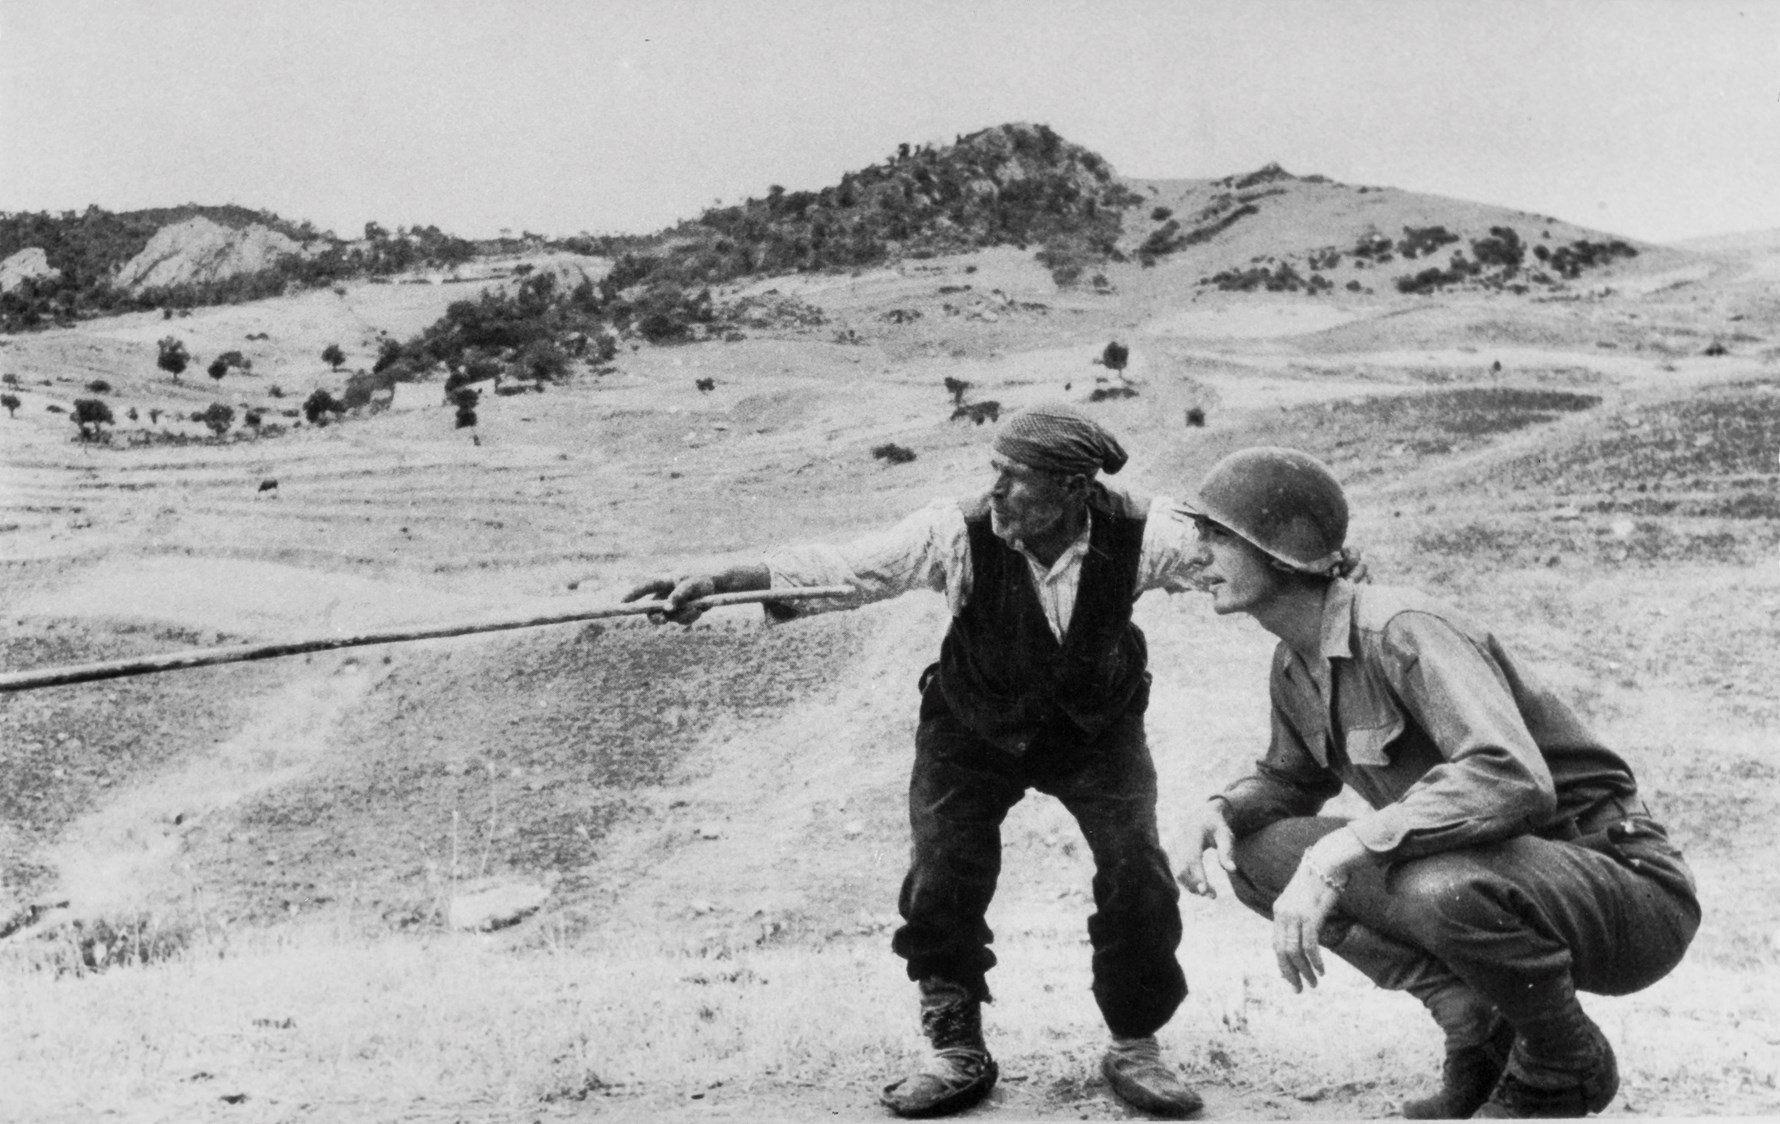 Robert Capa, Sicilia, nei pressi di Troina (provincia di Enna), agosto 1943. © Robert Capa - Courtesy International Center of Photography/Magnum Photo